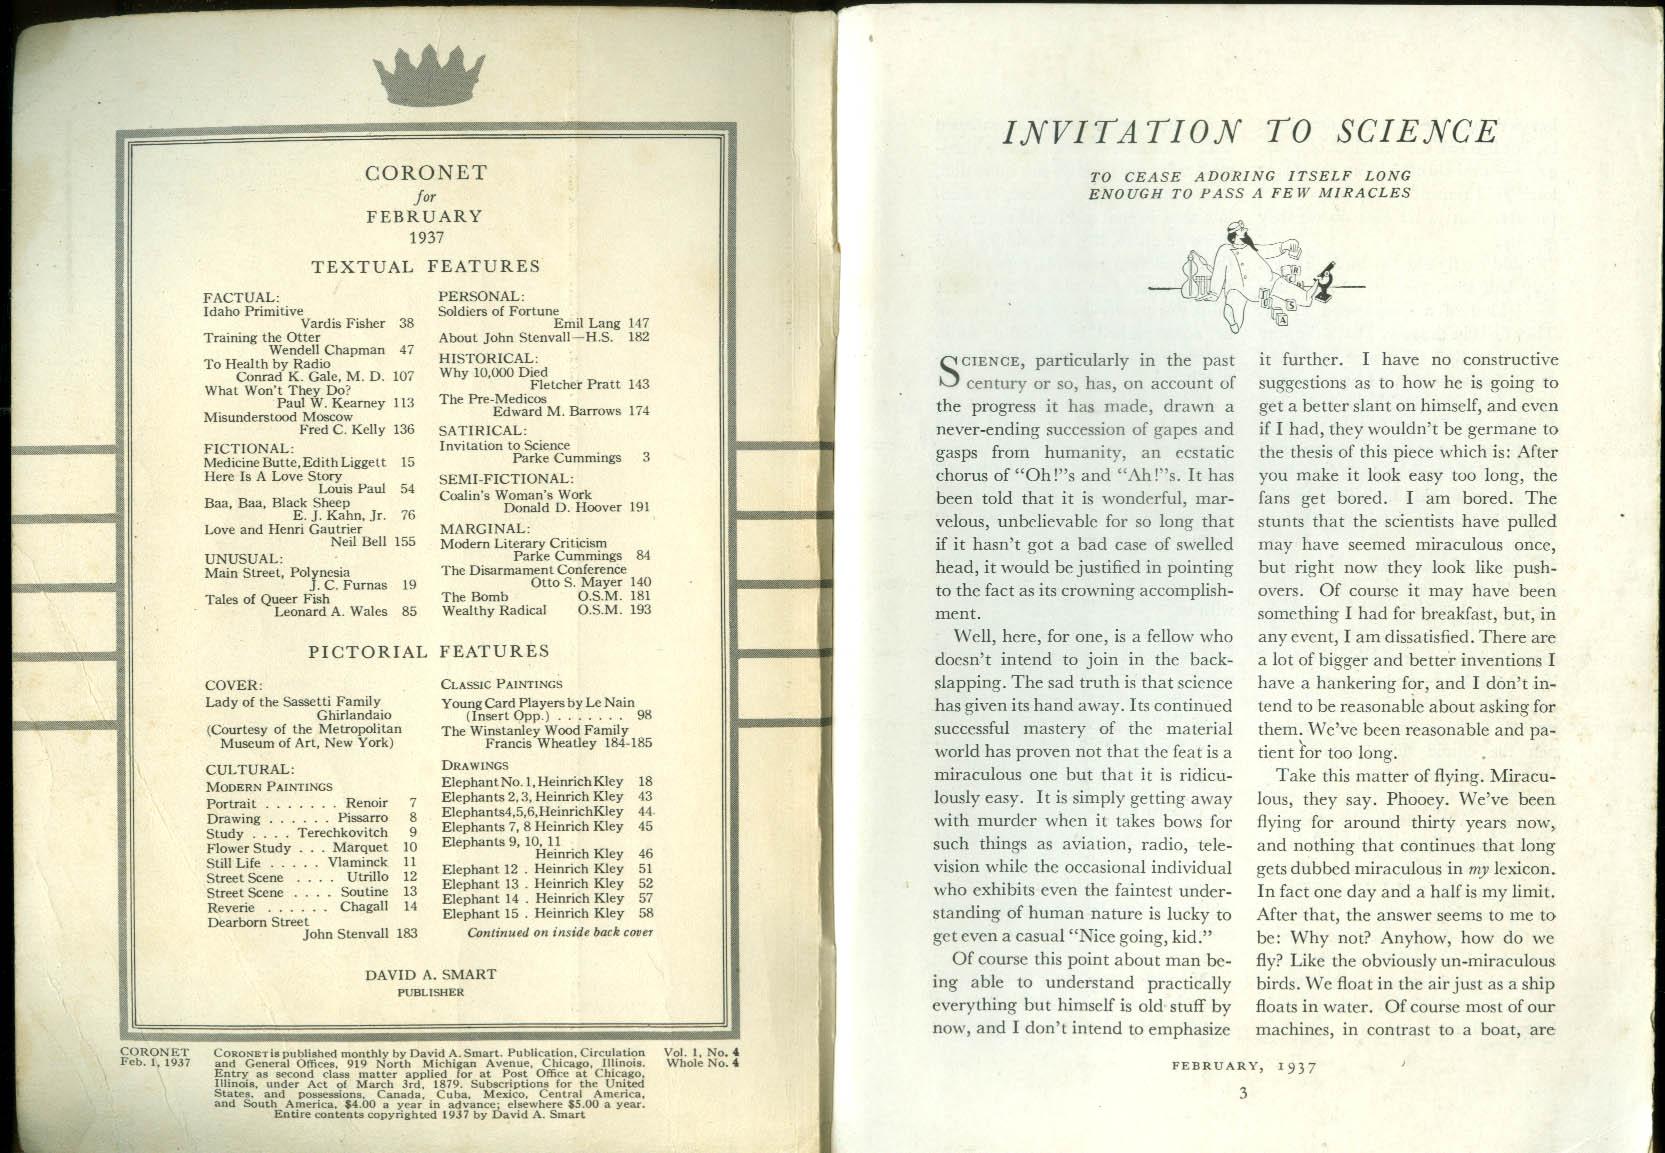 CORONET 2 1937 John Stenvall Henri Gautier Heinrich Kley elephants Gyula Ramhab